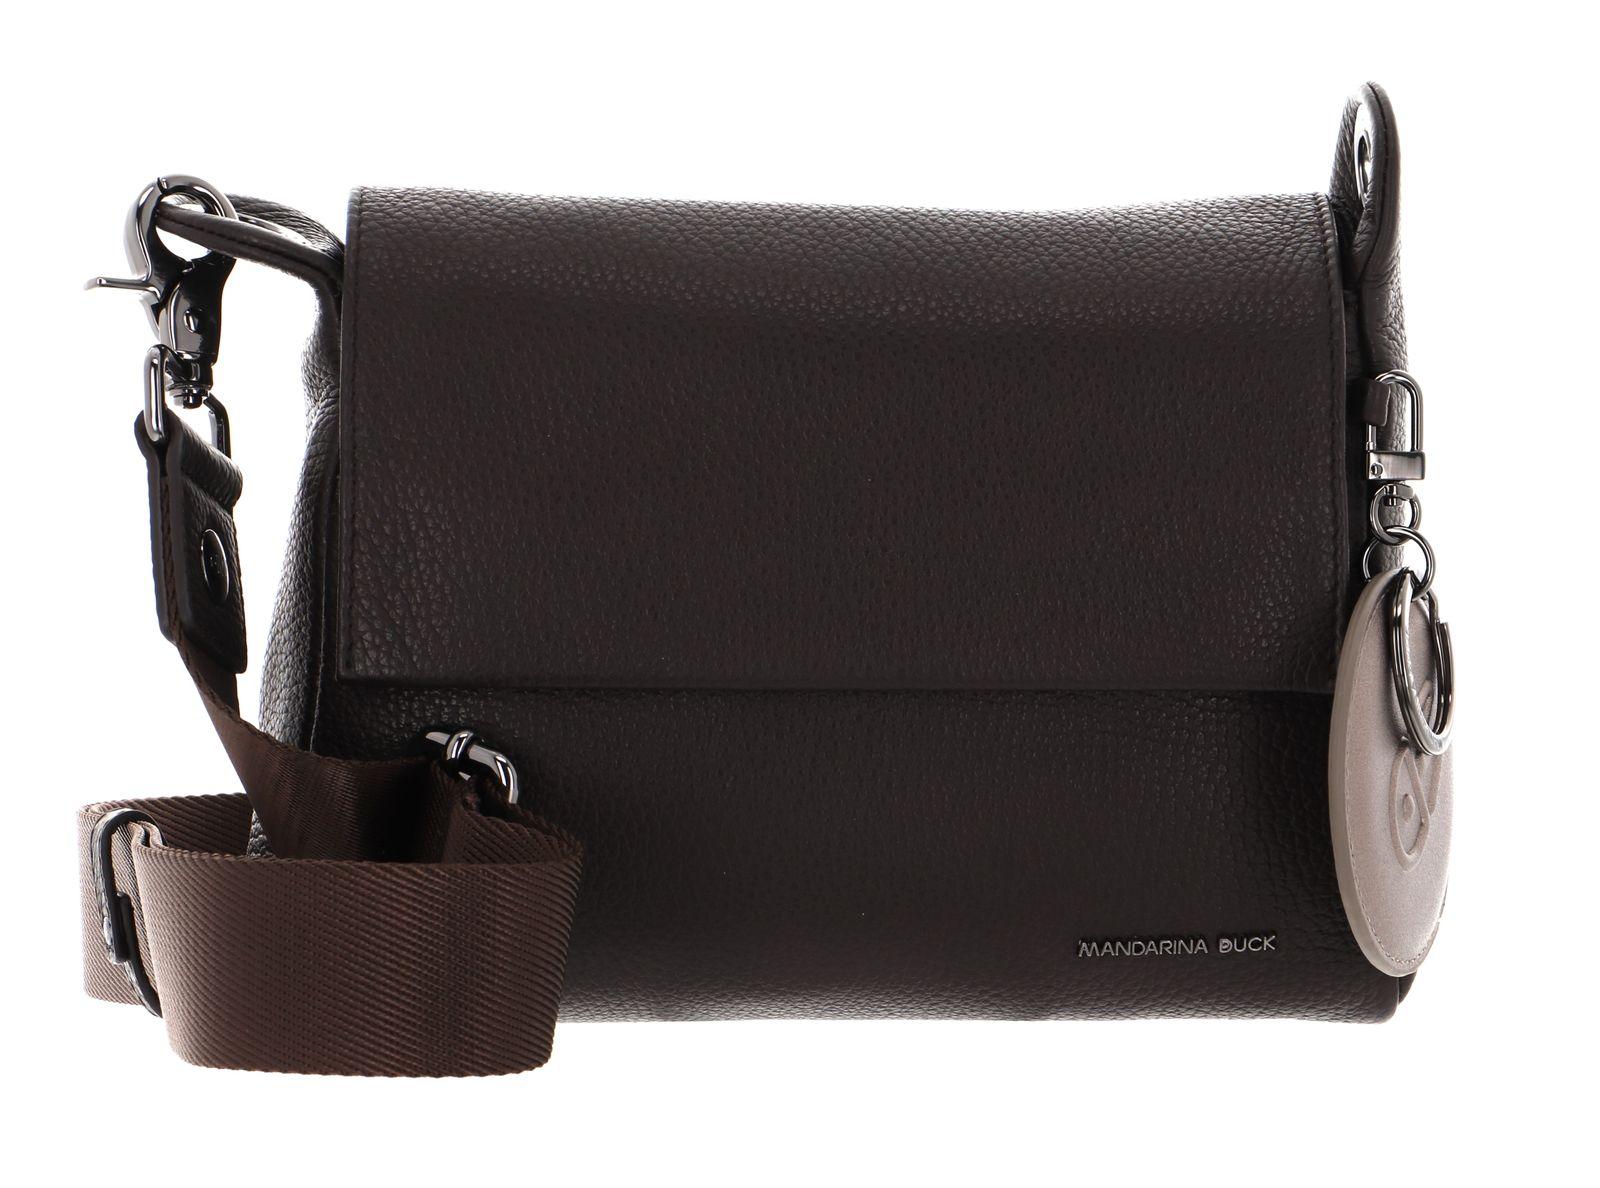 MANDARINA DUCK Mellow Leather Crossover Bag S Mole